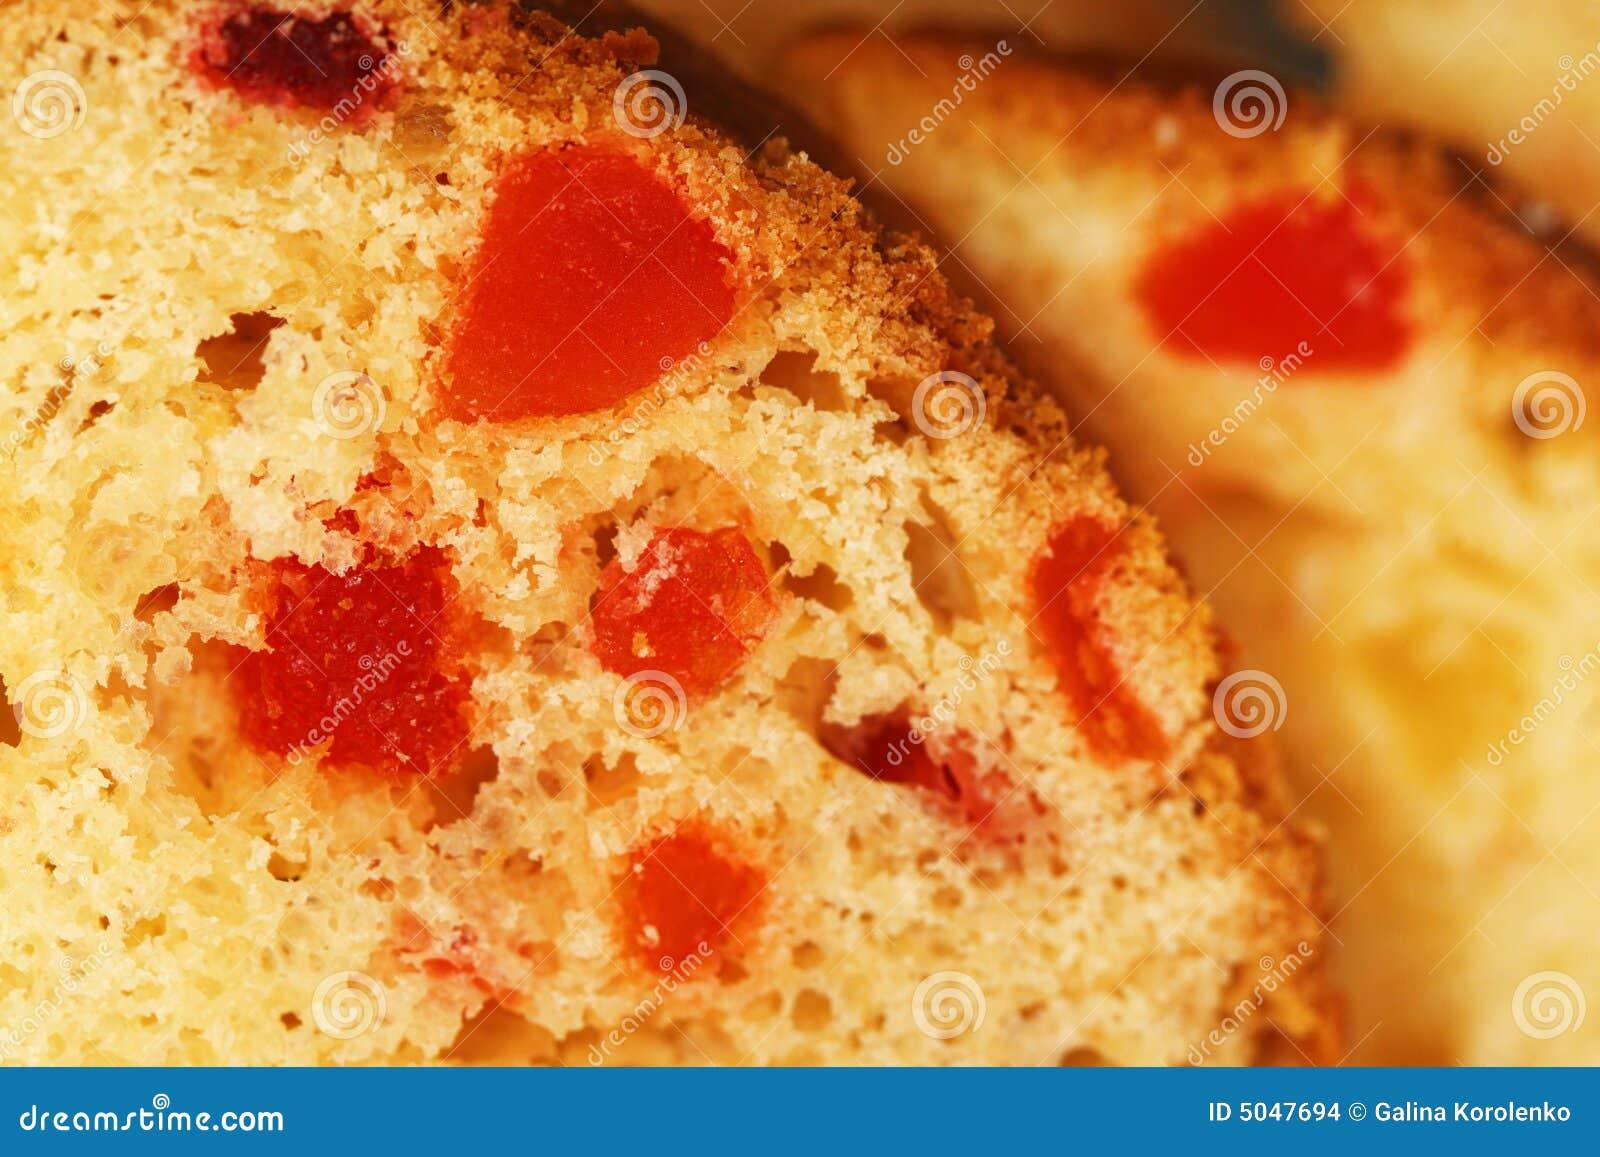 Ciasto owocowe dwa plasterki blisko,